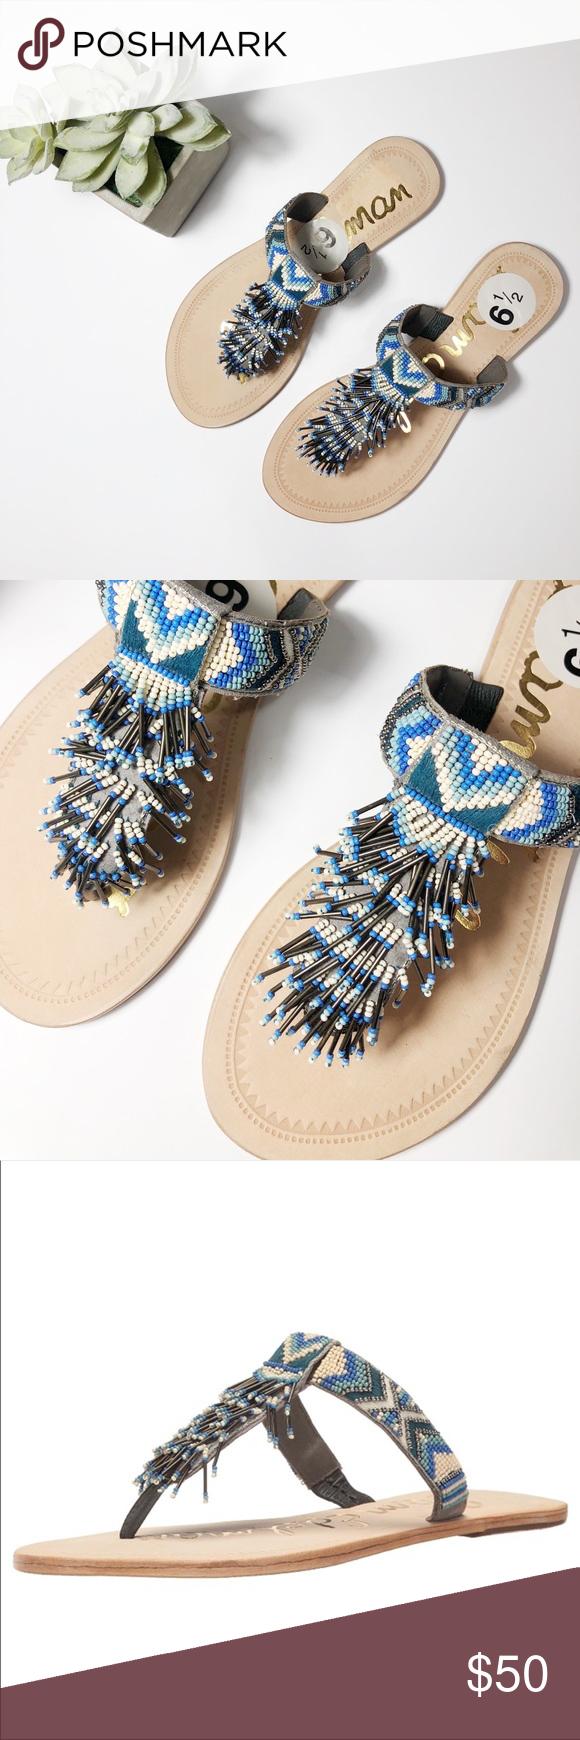 d65e8d01ac5c Sam Edelman anella beaded thong sandals brand new sam edelman anella sandals